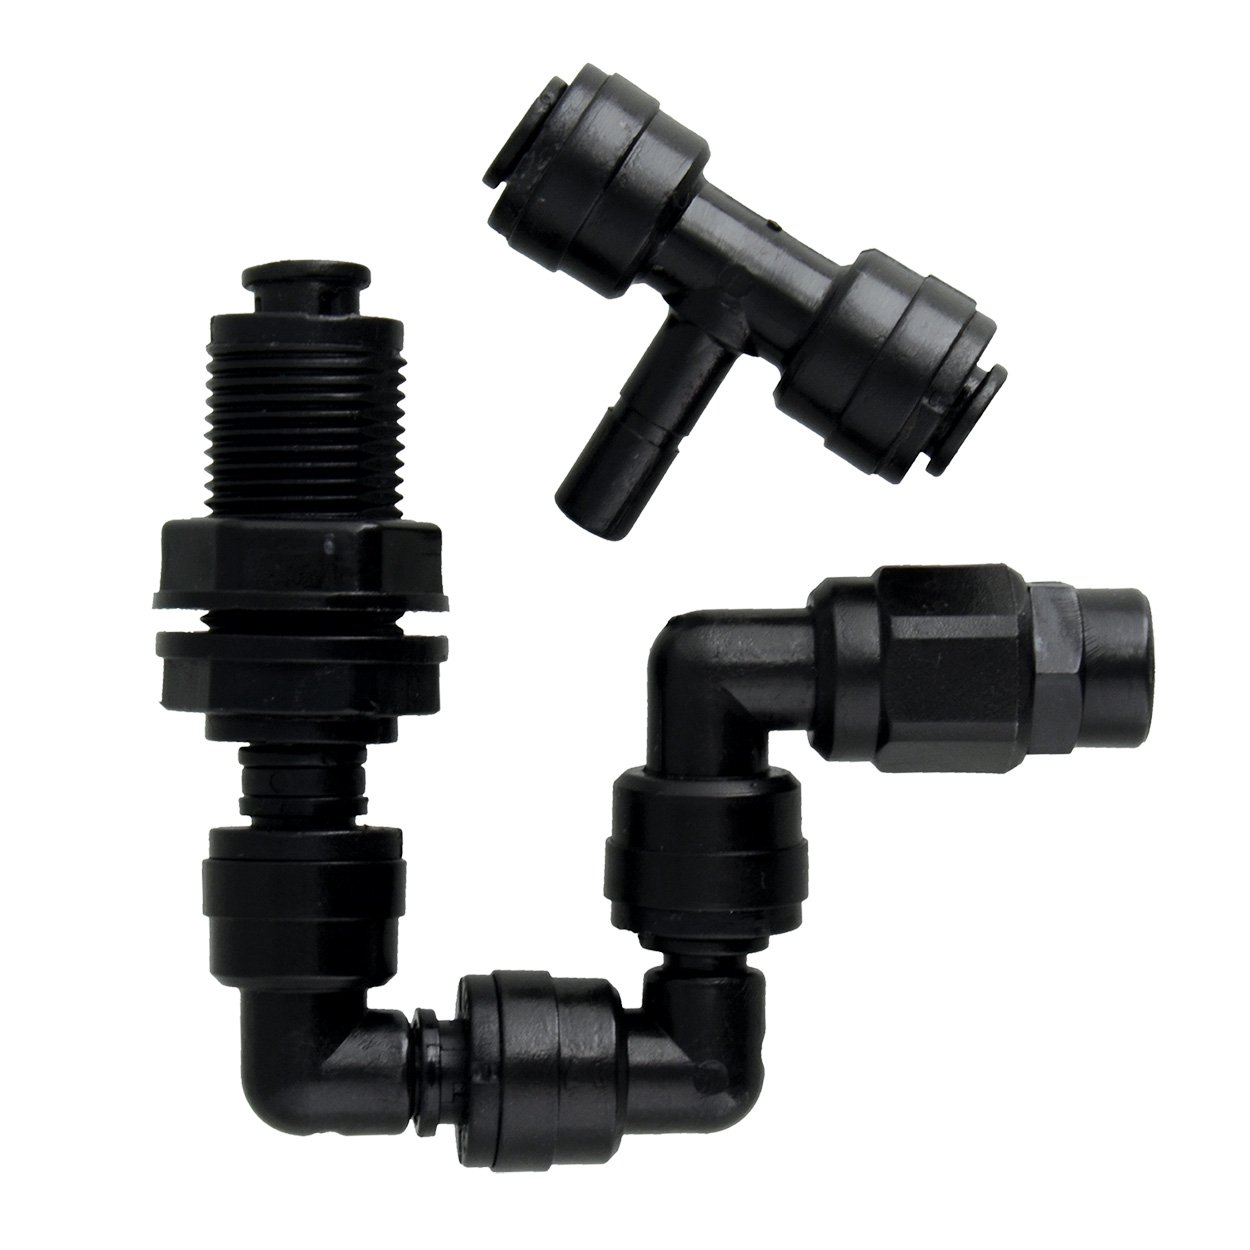 MistKing 22257 Single Misting Assembly Fitting Value T